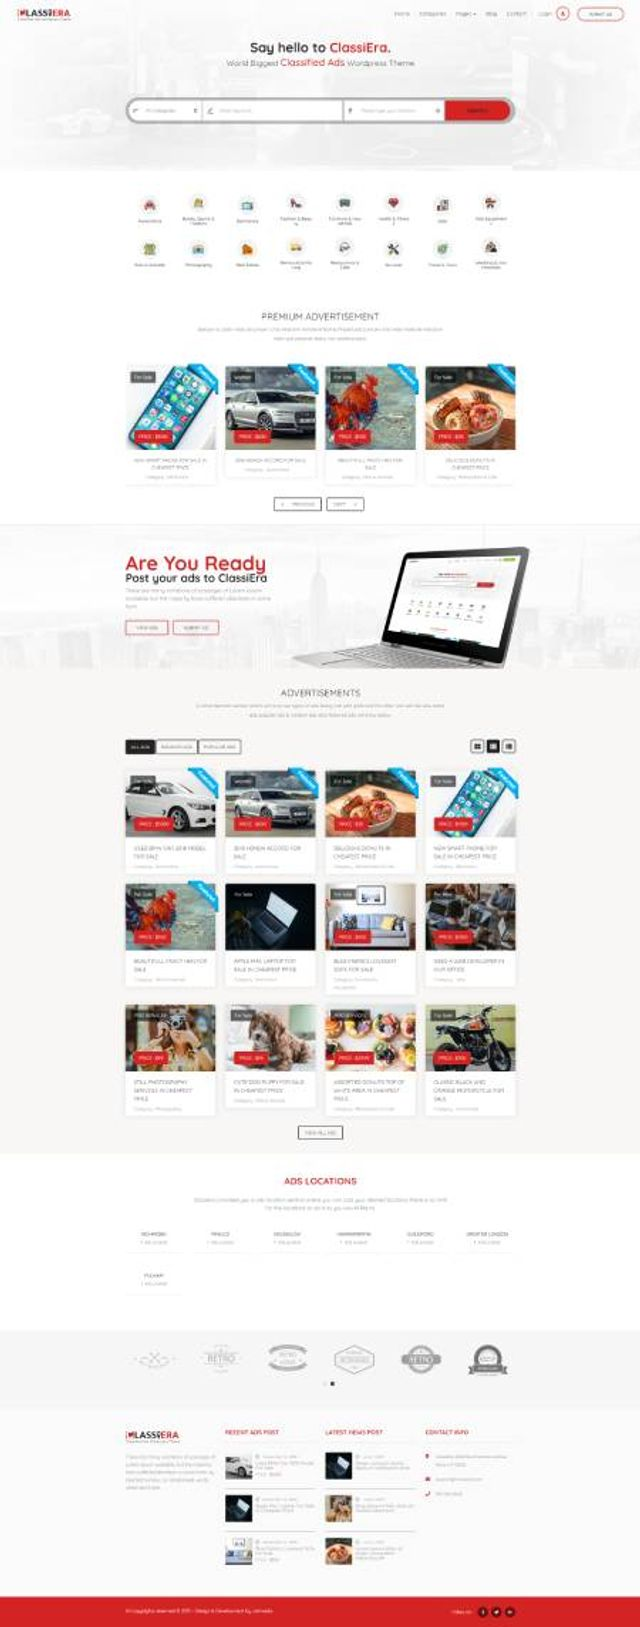 GD0724 – Mẫu Website Rao Vặt Classiera